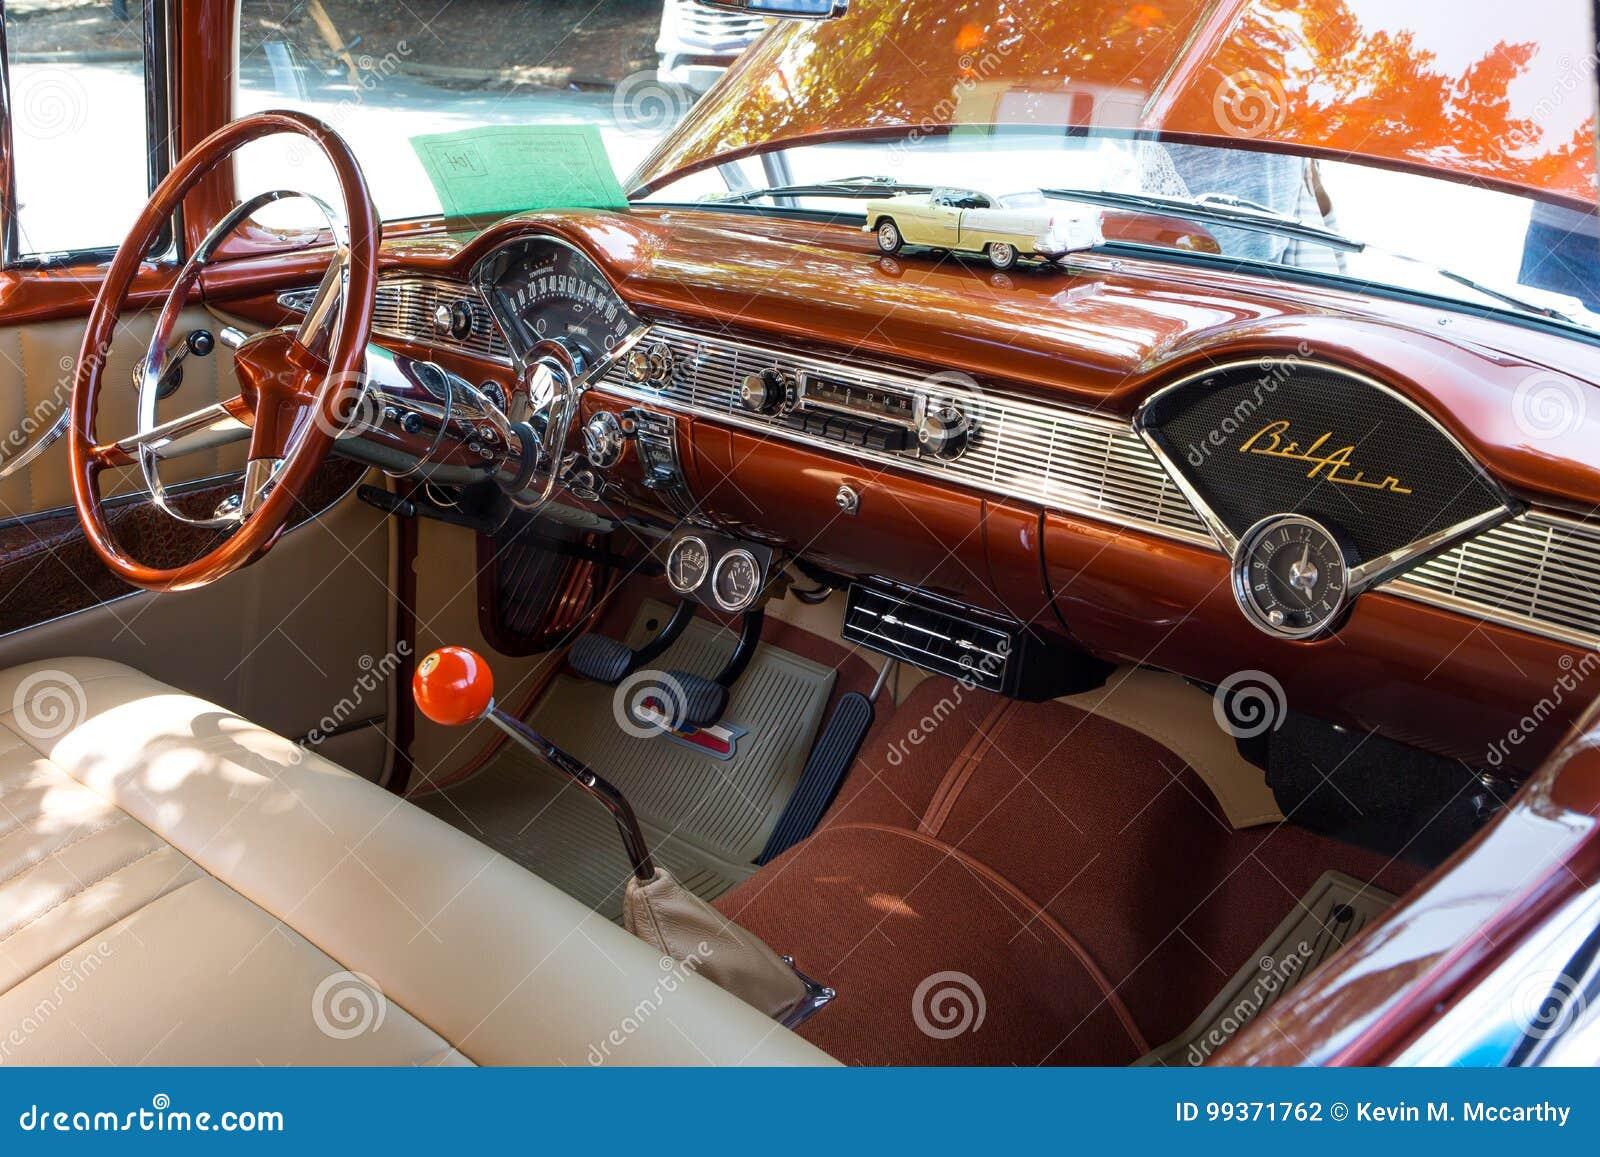 Phenomenal 1956 Chevy Bel Air Dashboard Editorial Photography Image Beutiful Home Inspiration Semekurdistantinfo